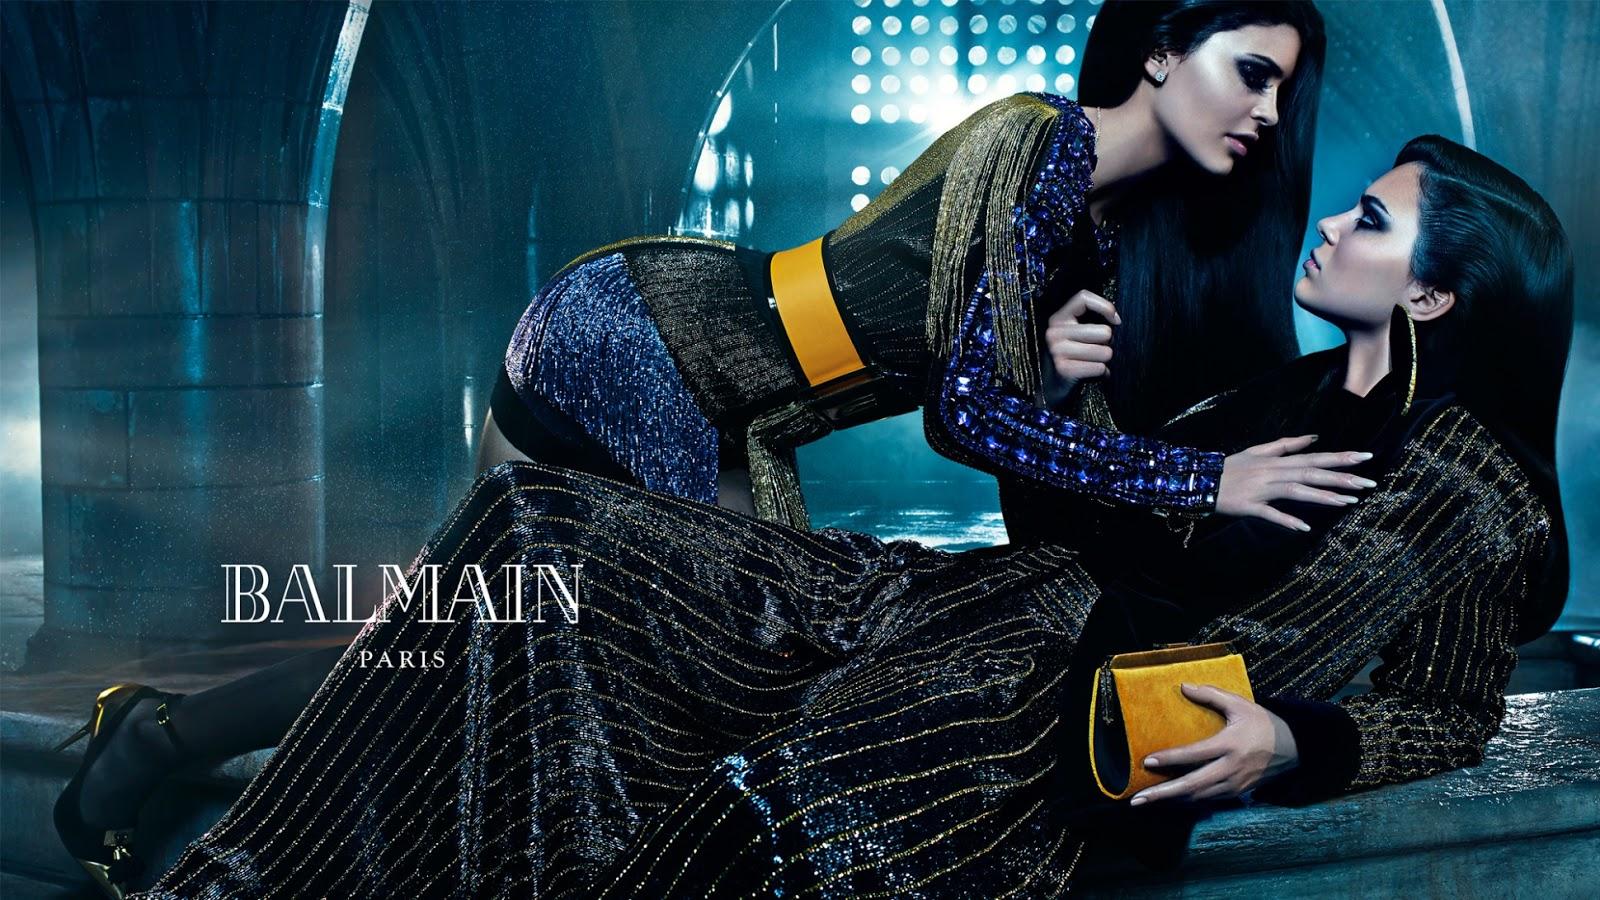 Balmain Ads Campaign 2015